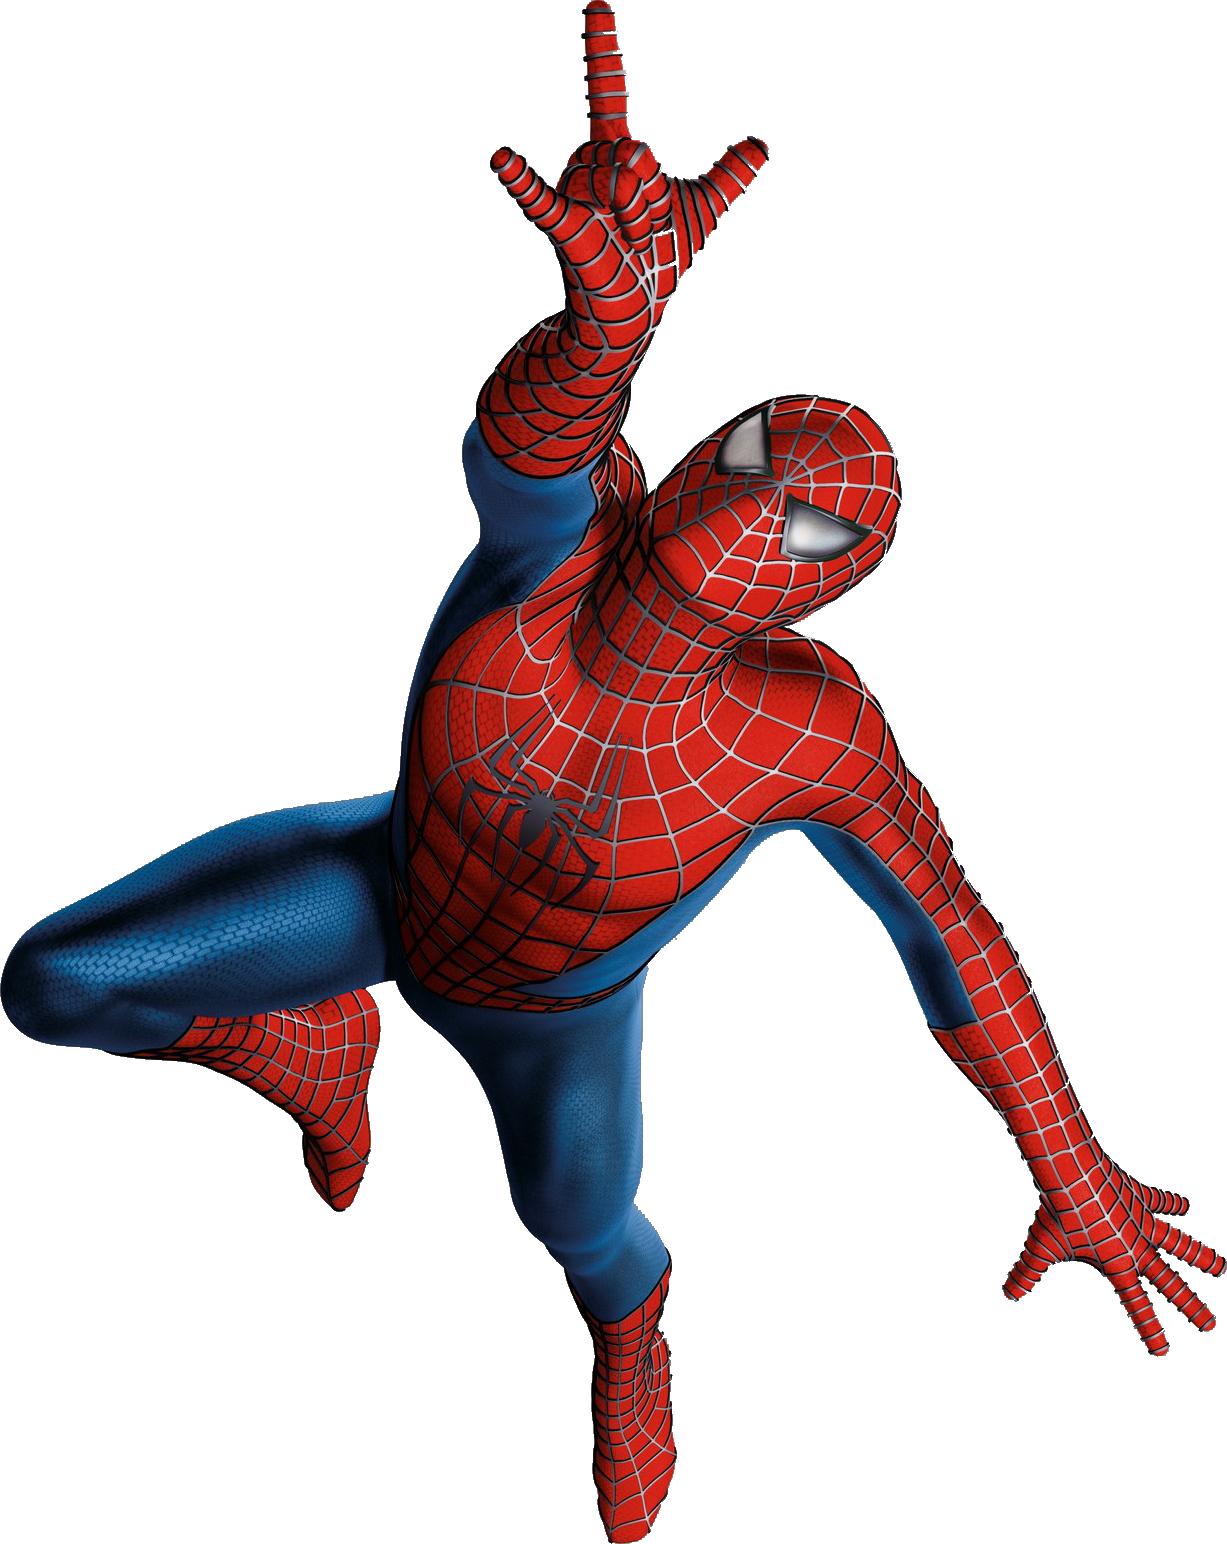 32+ Spiderman transparent info